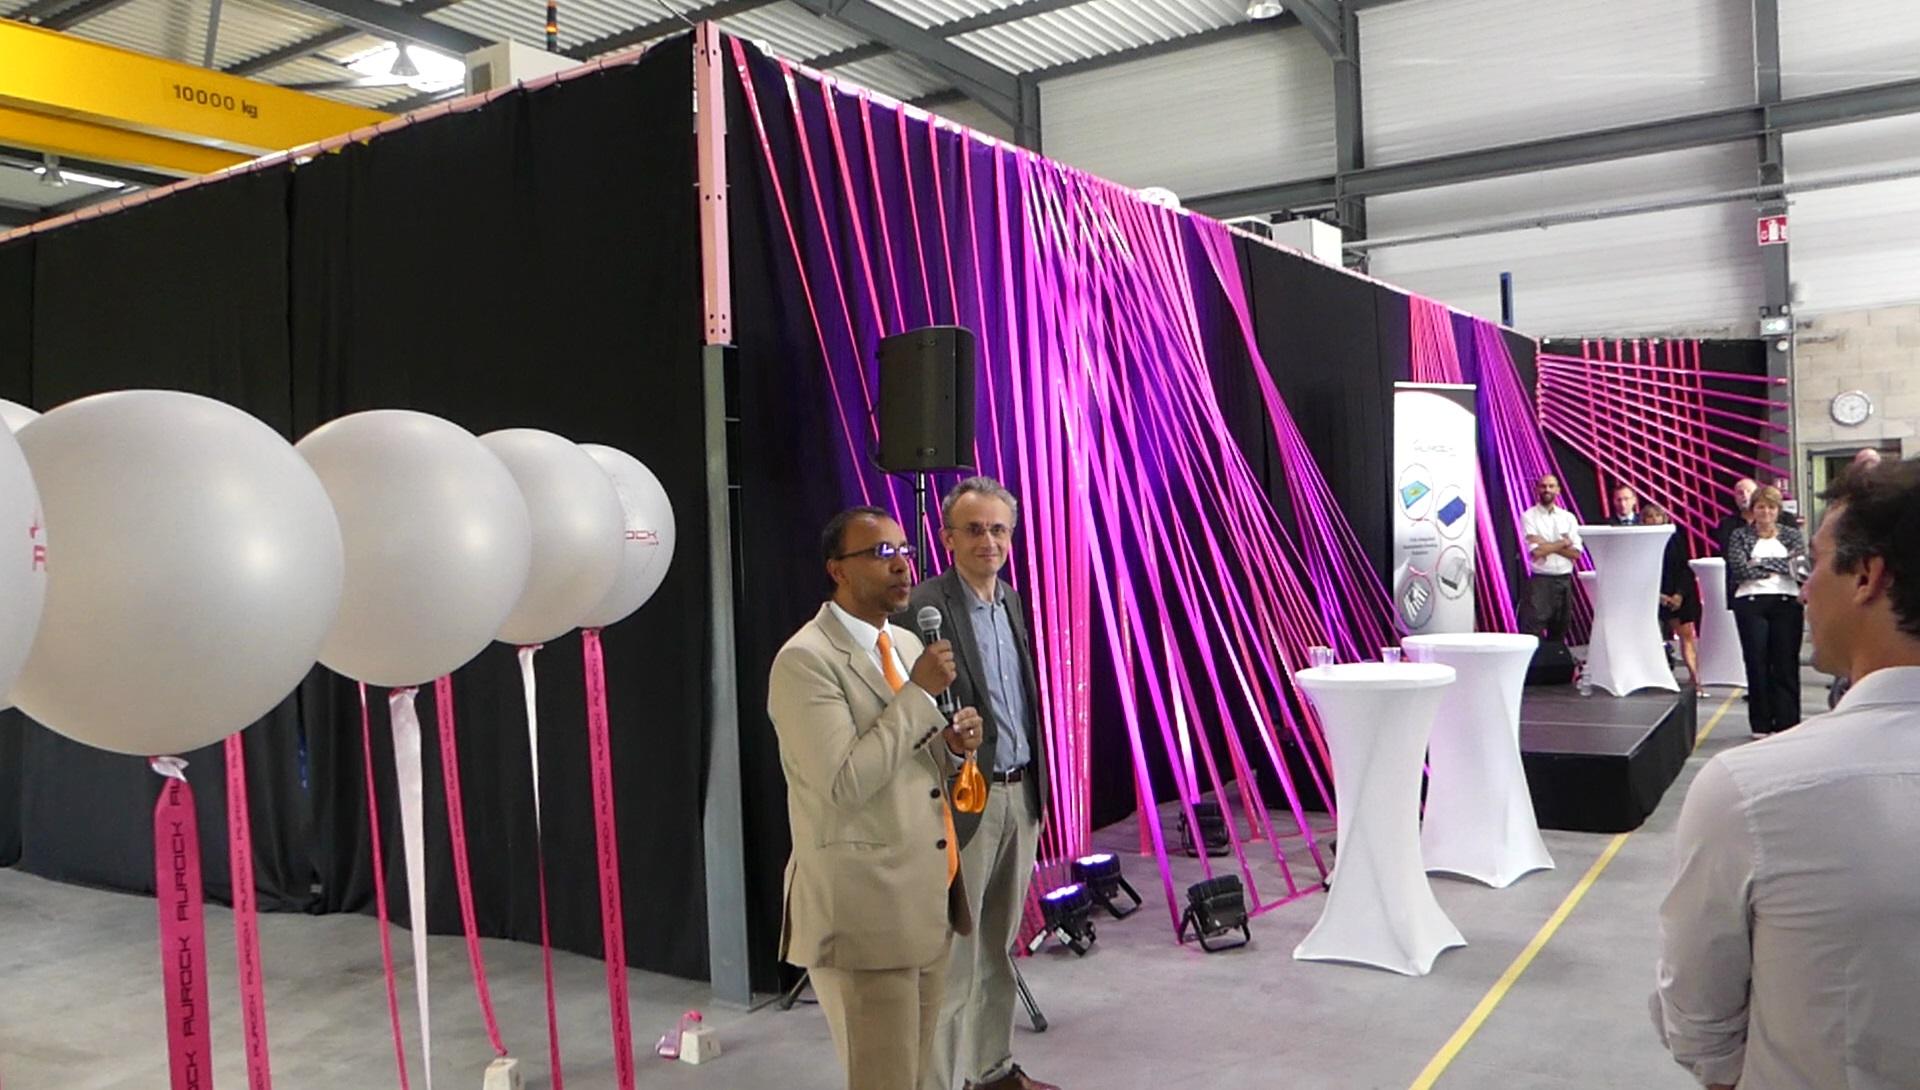 N. Jussien – Directeur IMT Mines Albi, T. Cutard – Directeur ICA Albi